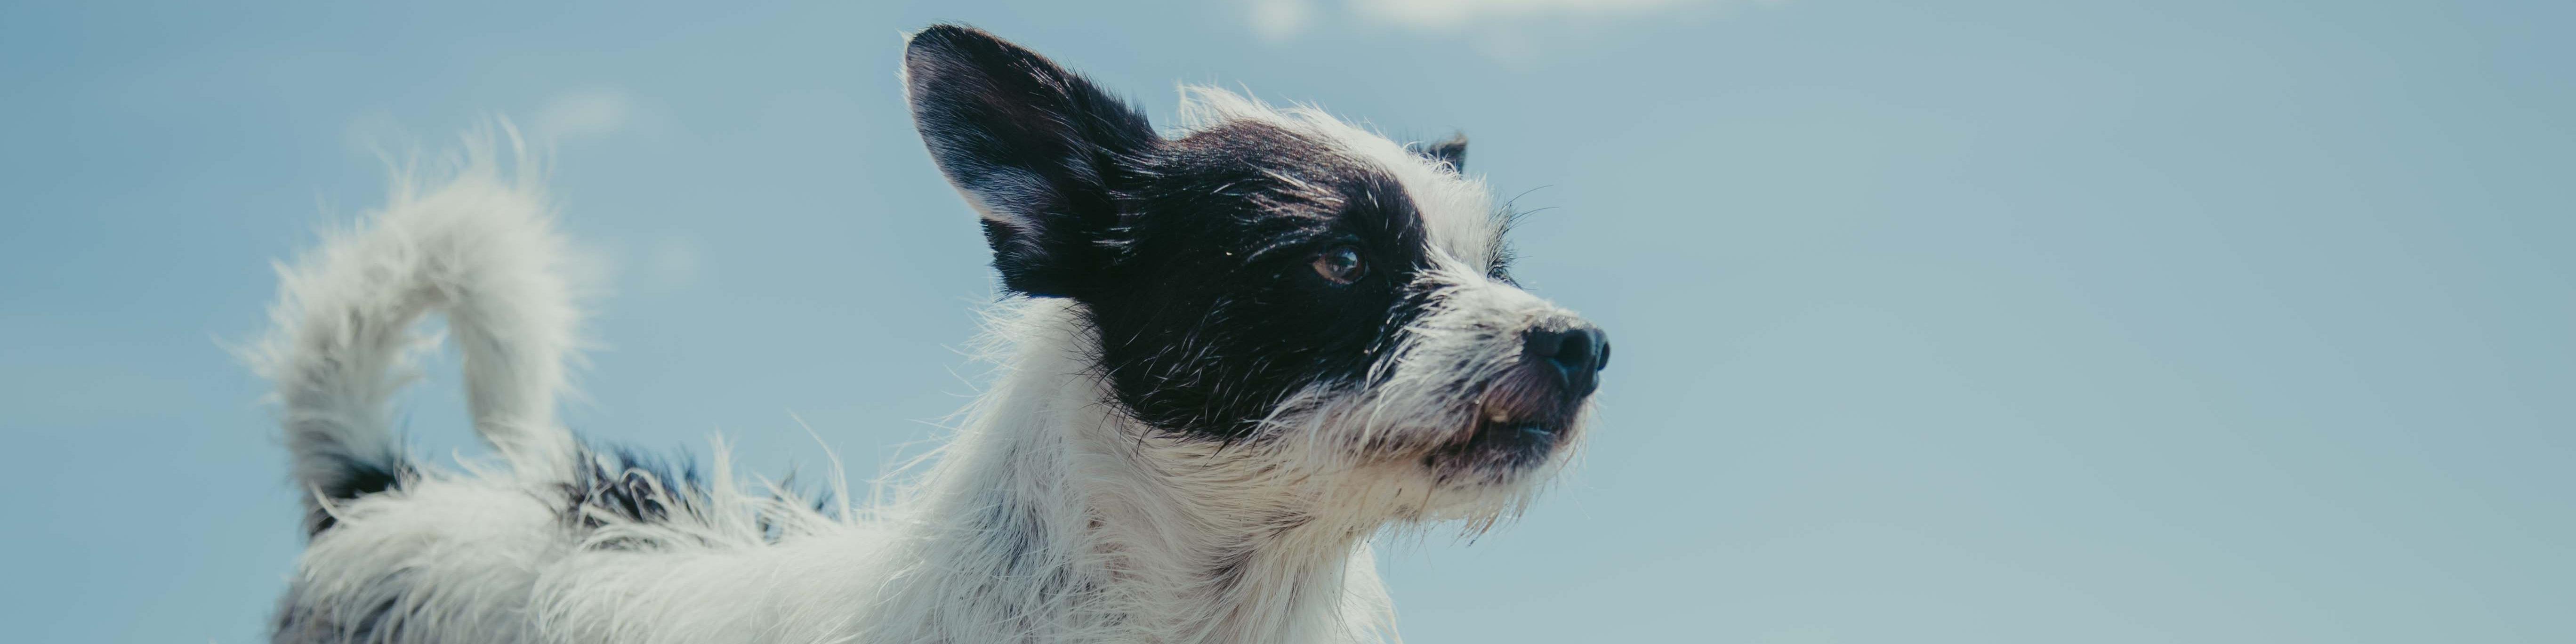 Hundeschule kleiner Hund